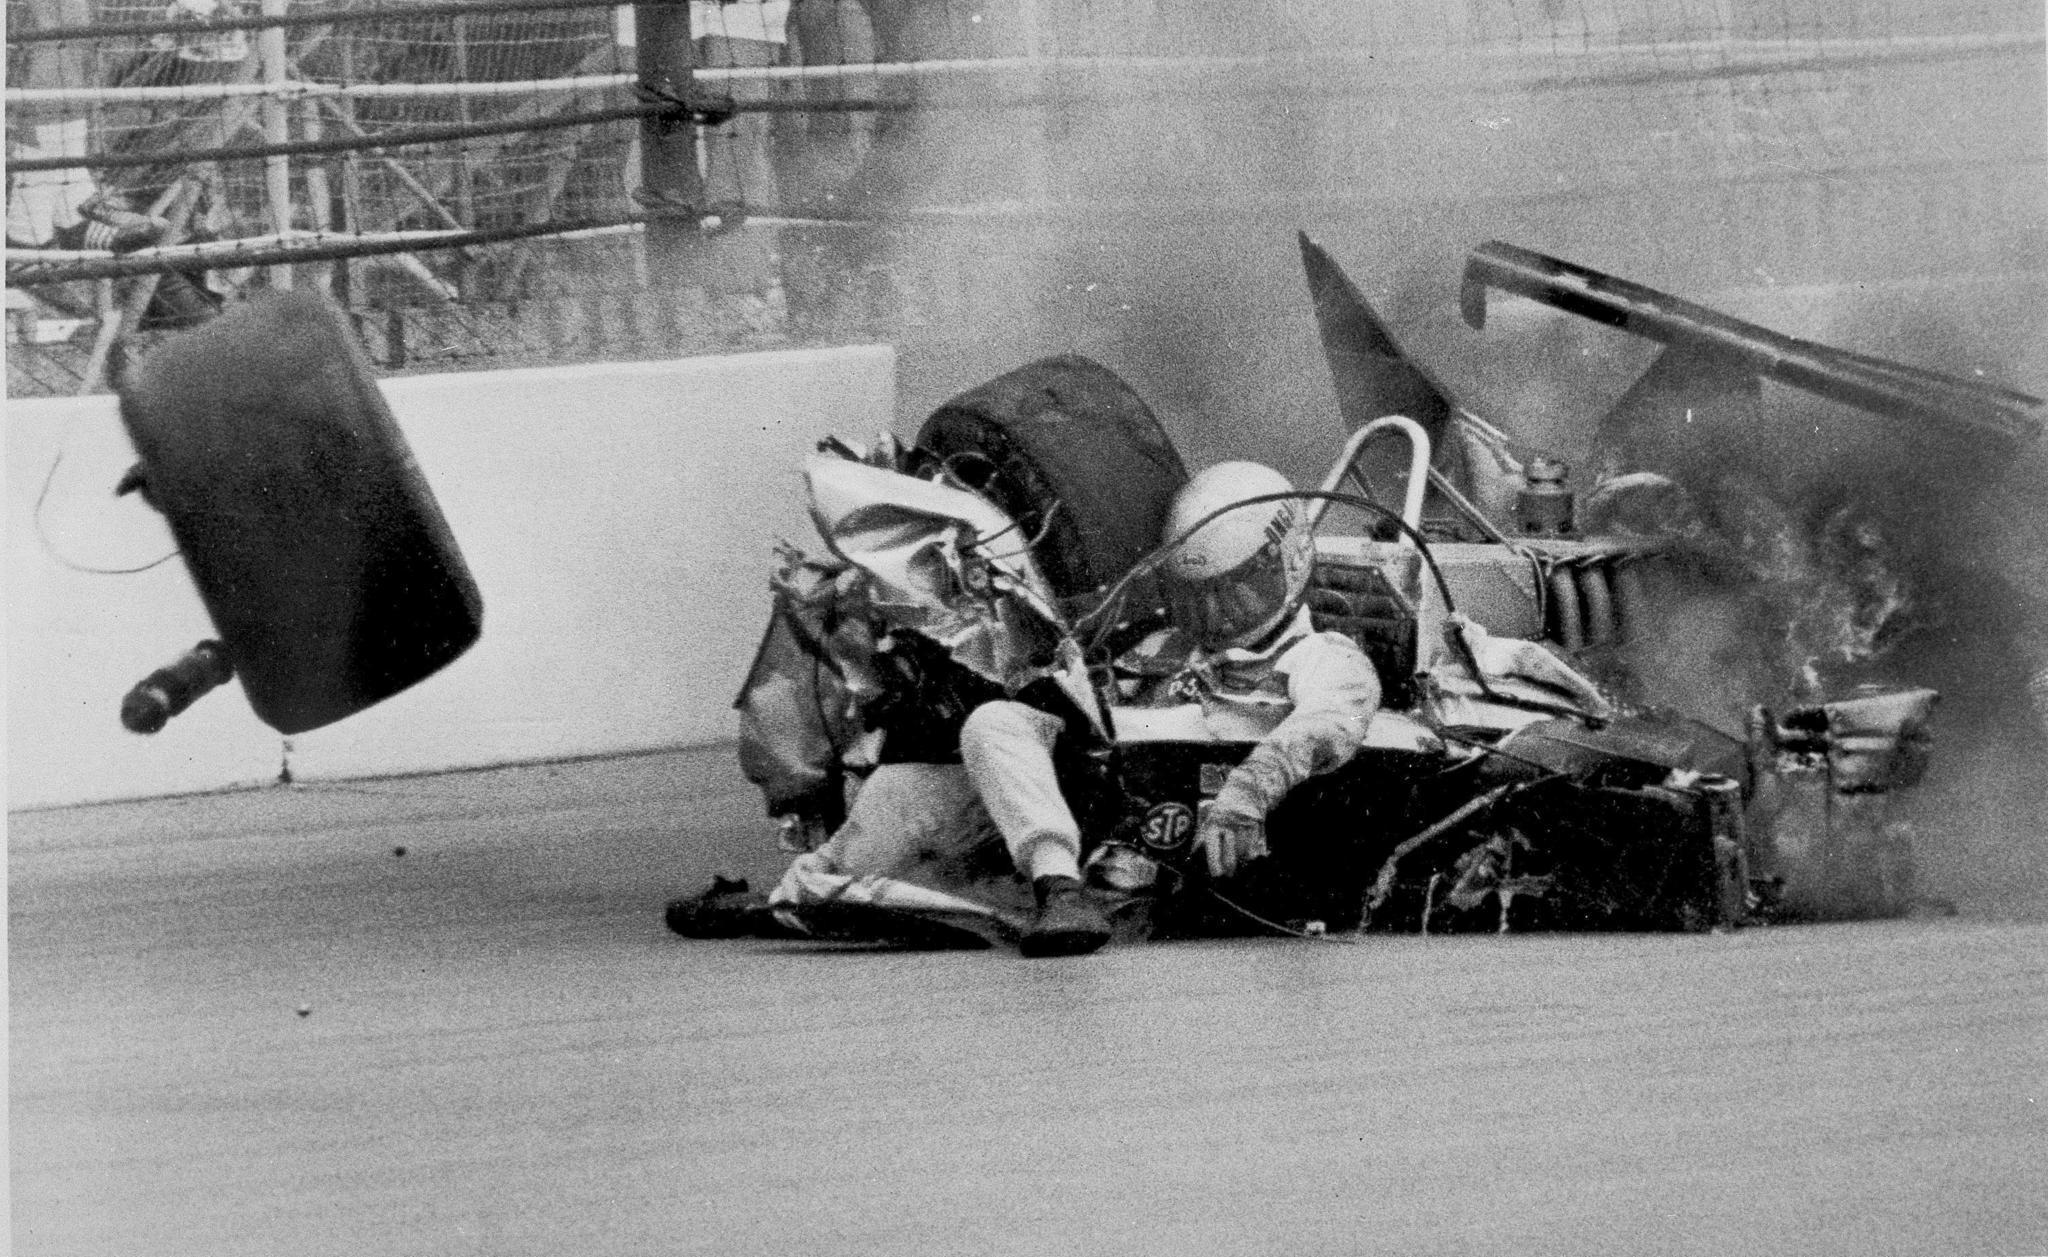 Gordon Smiley Indy 500 1982